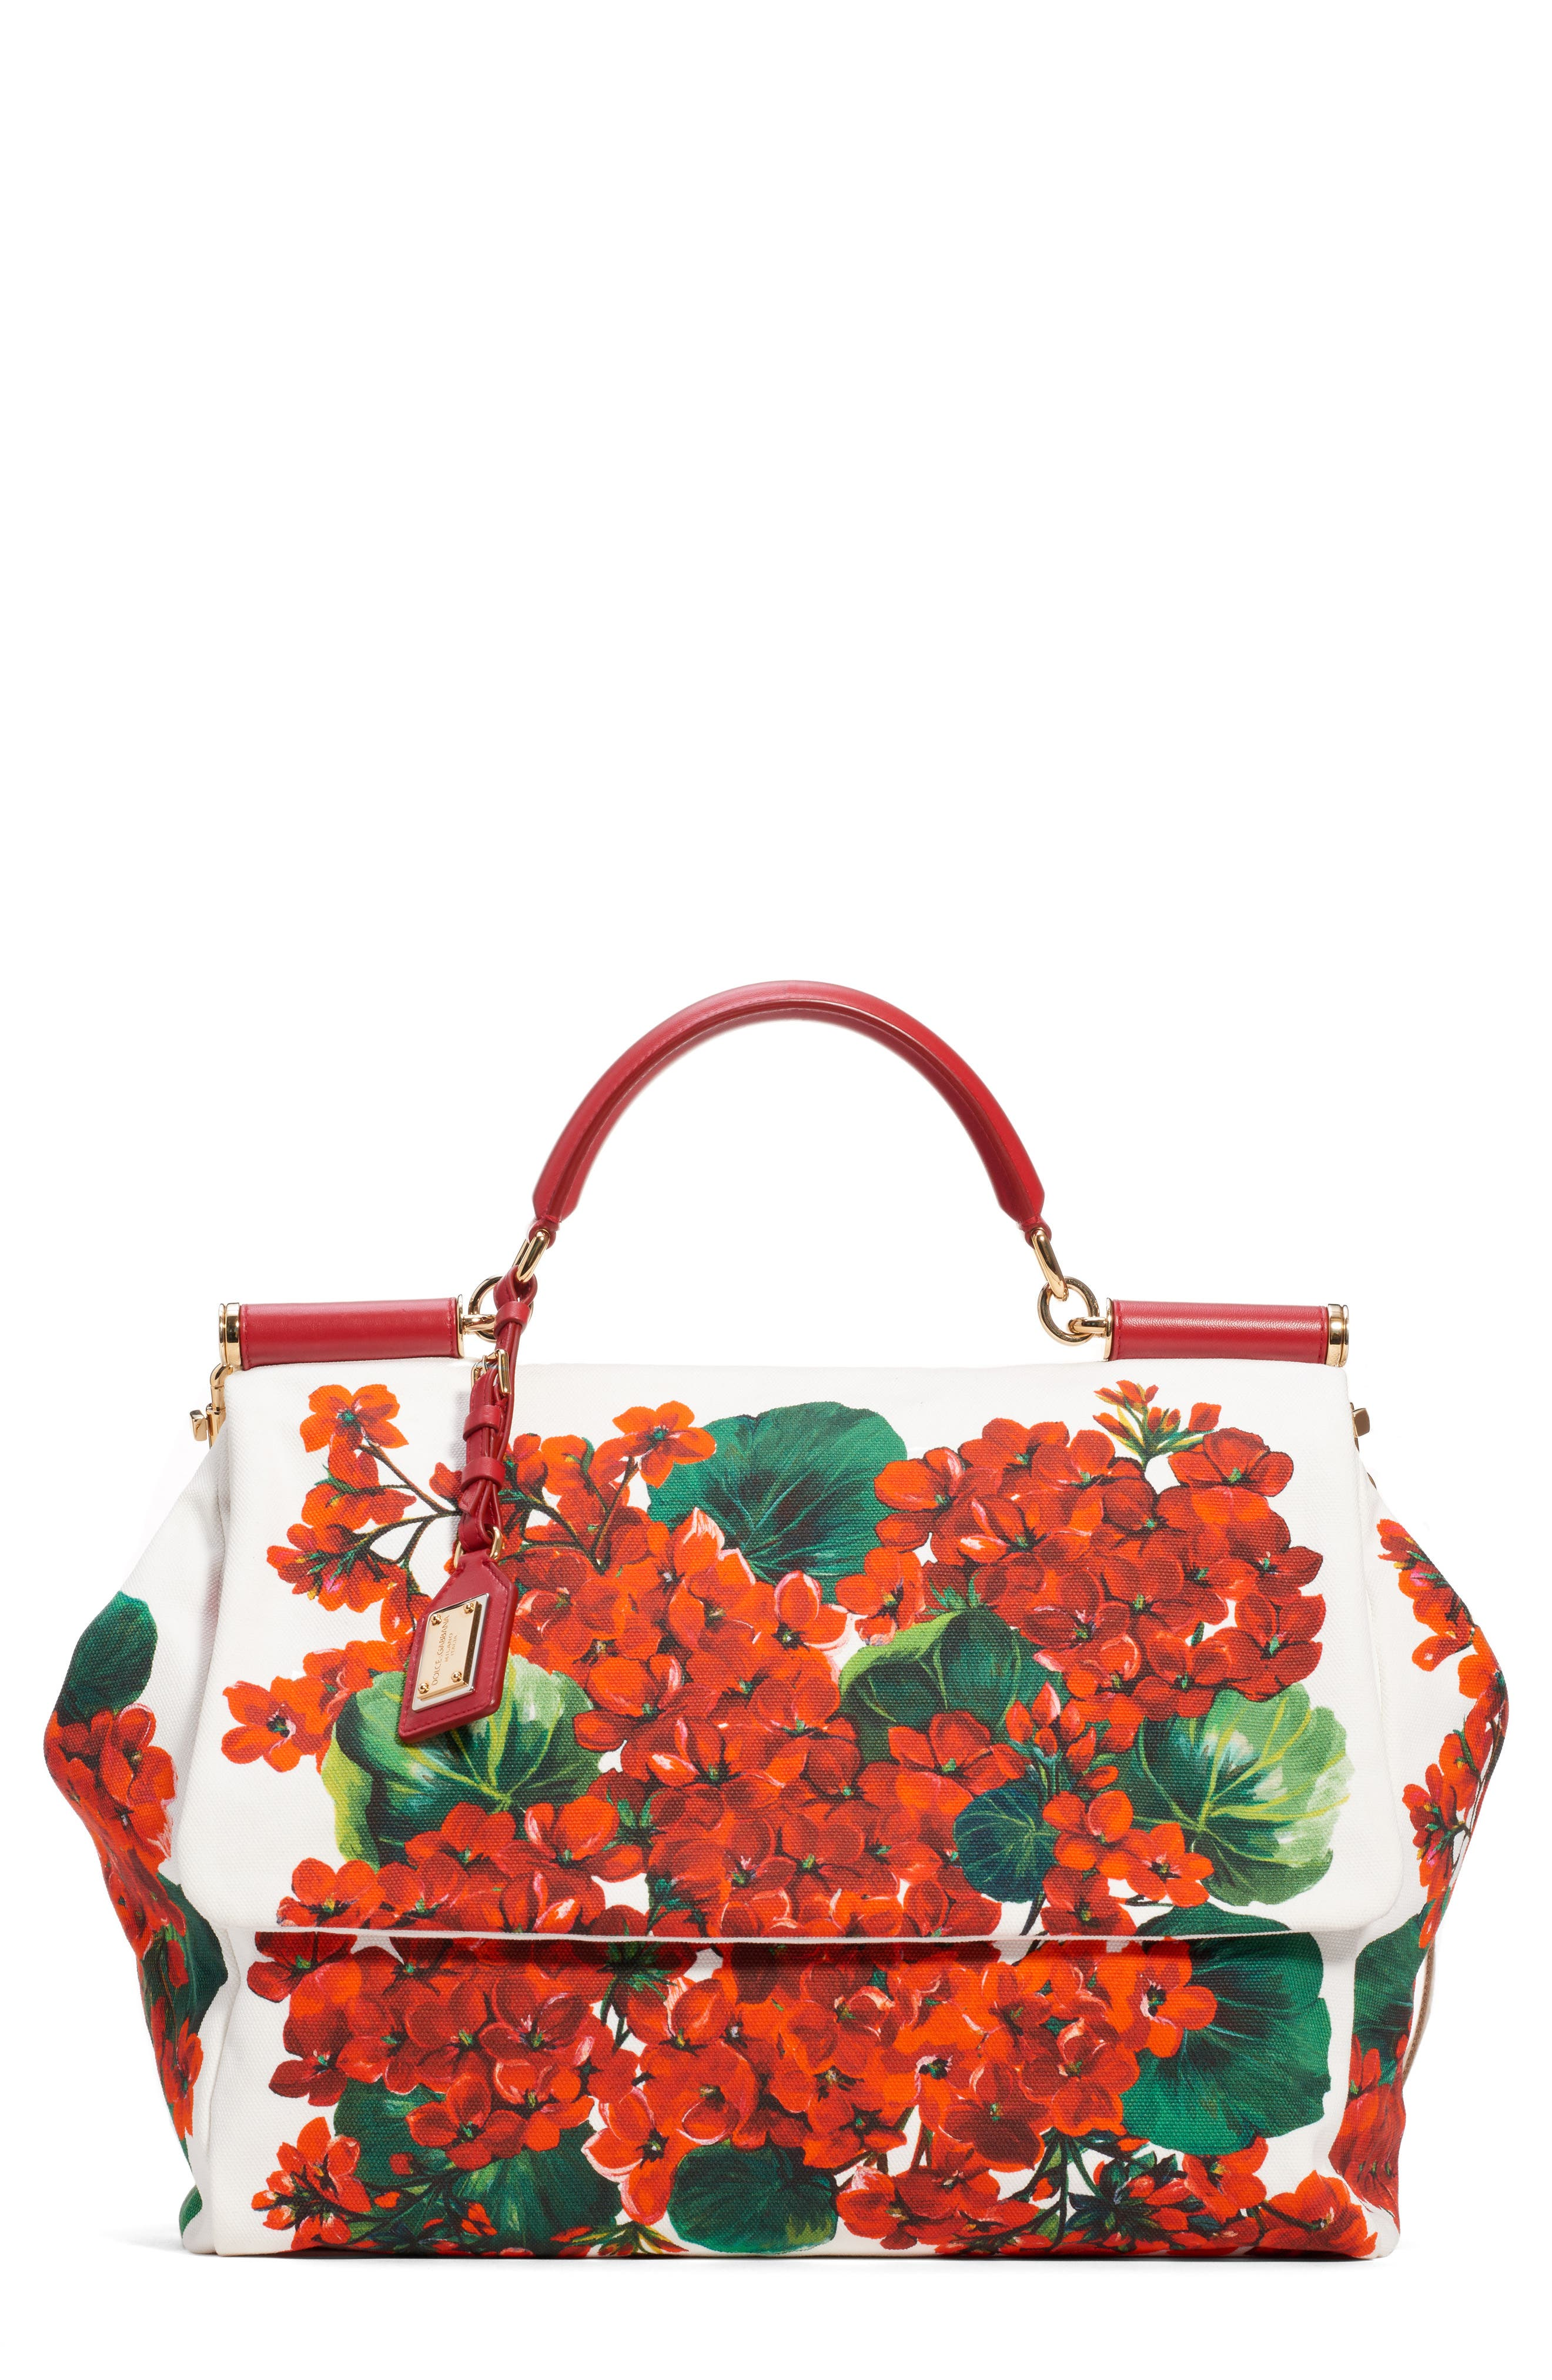 Dolce&gabbana Satchels Large Miss Sicily Floral Satchel